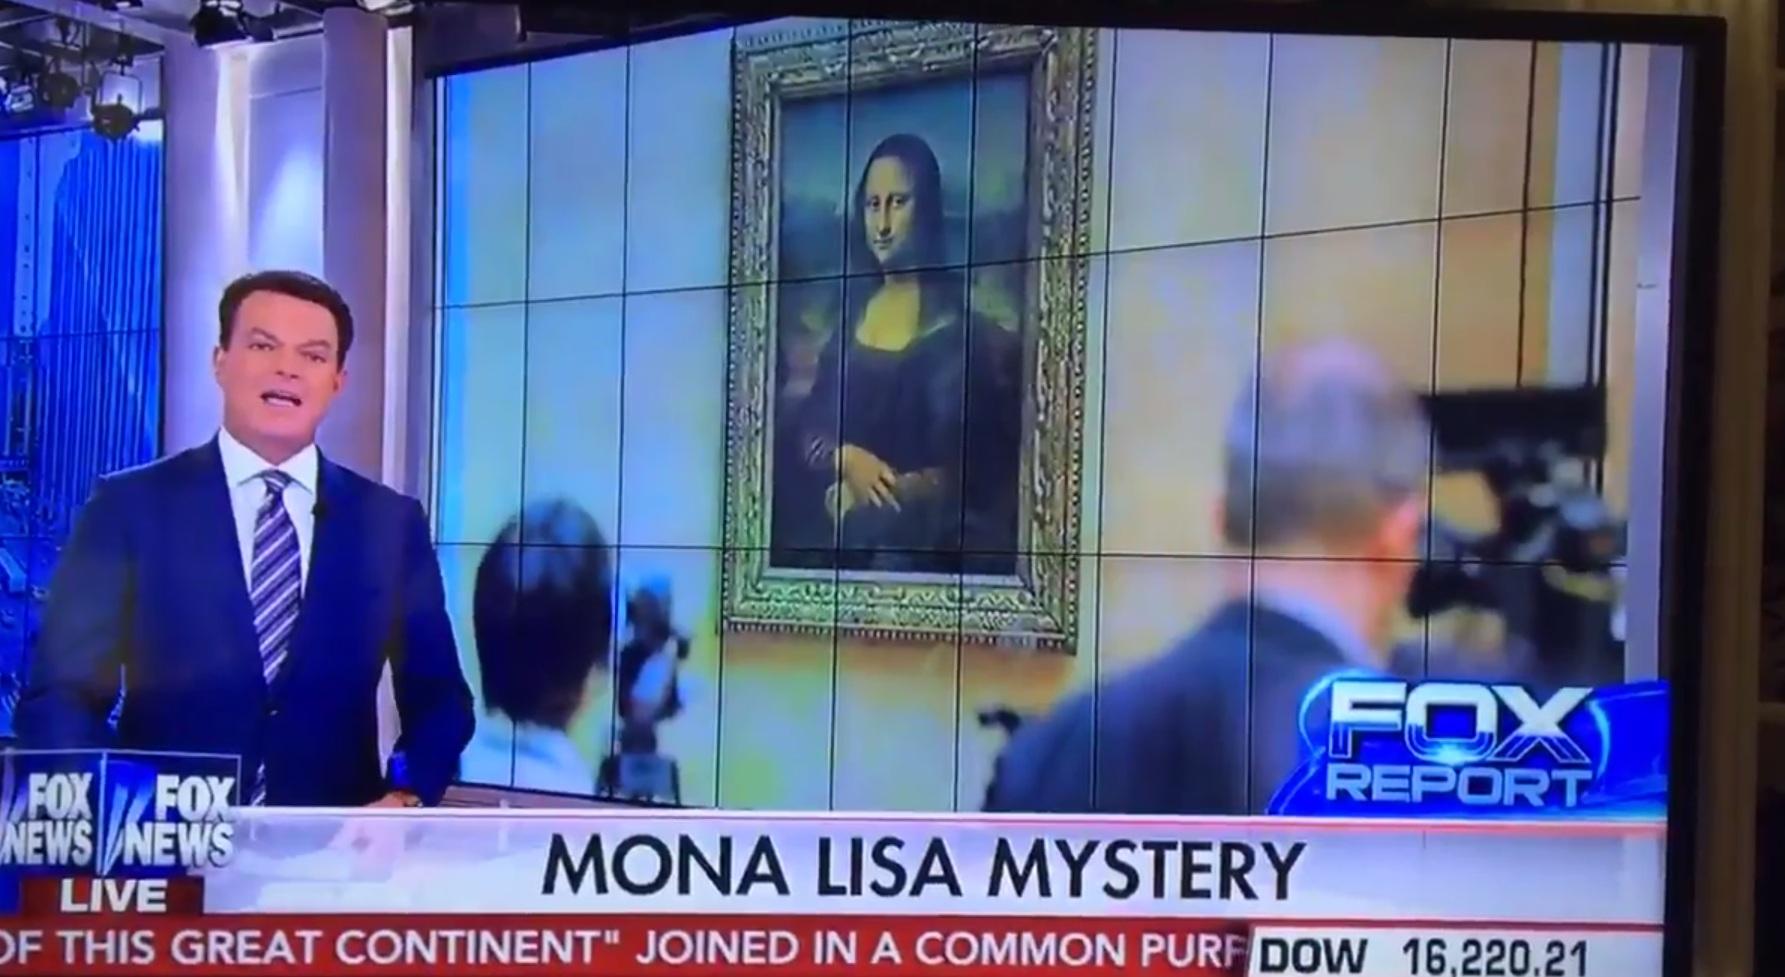 Reporter says Leonardo DiCaprio painted the Mona Lisa in live TV fail